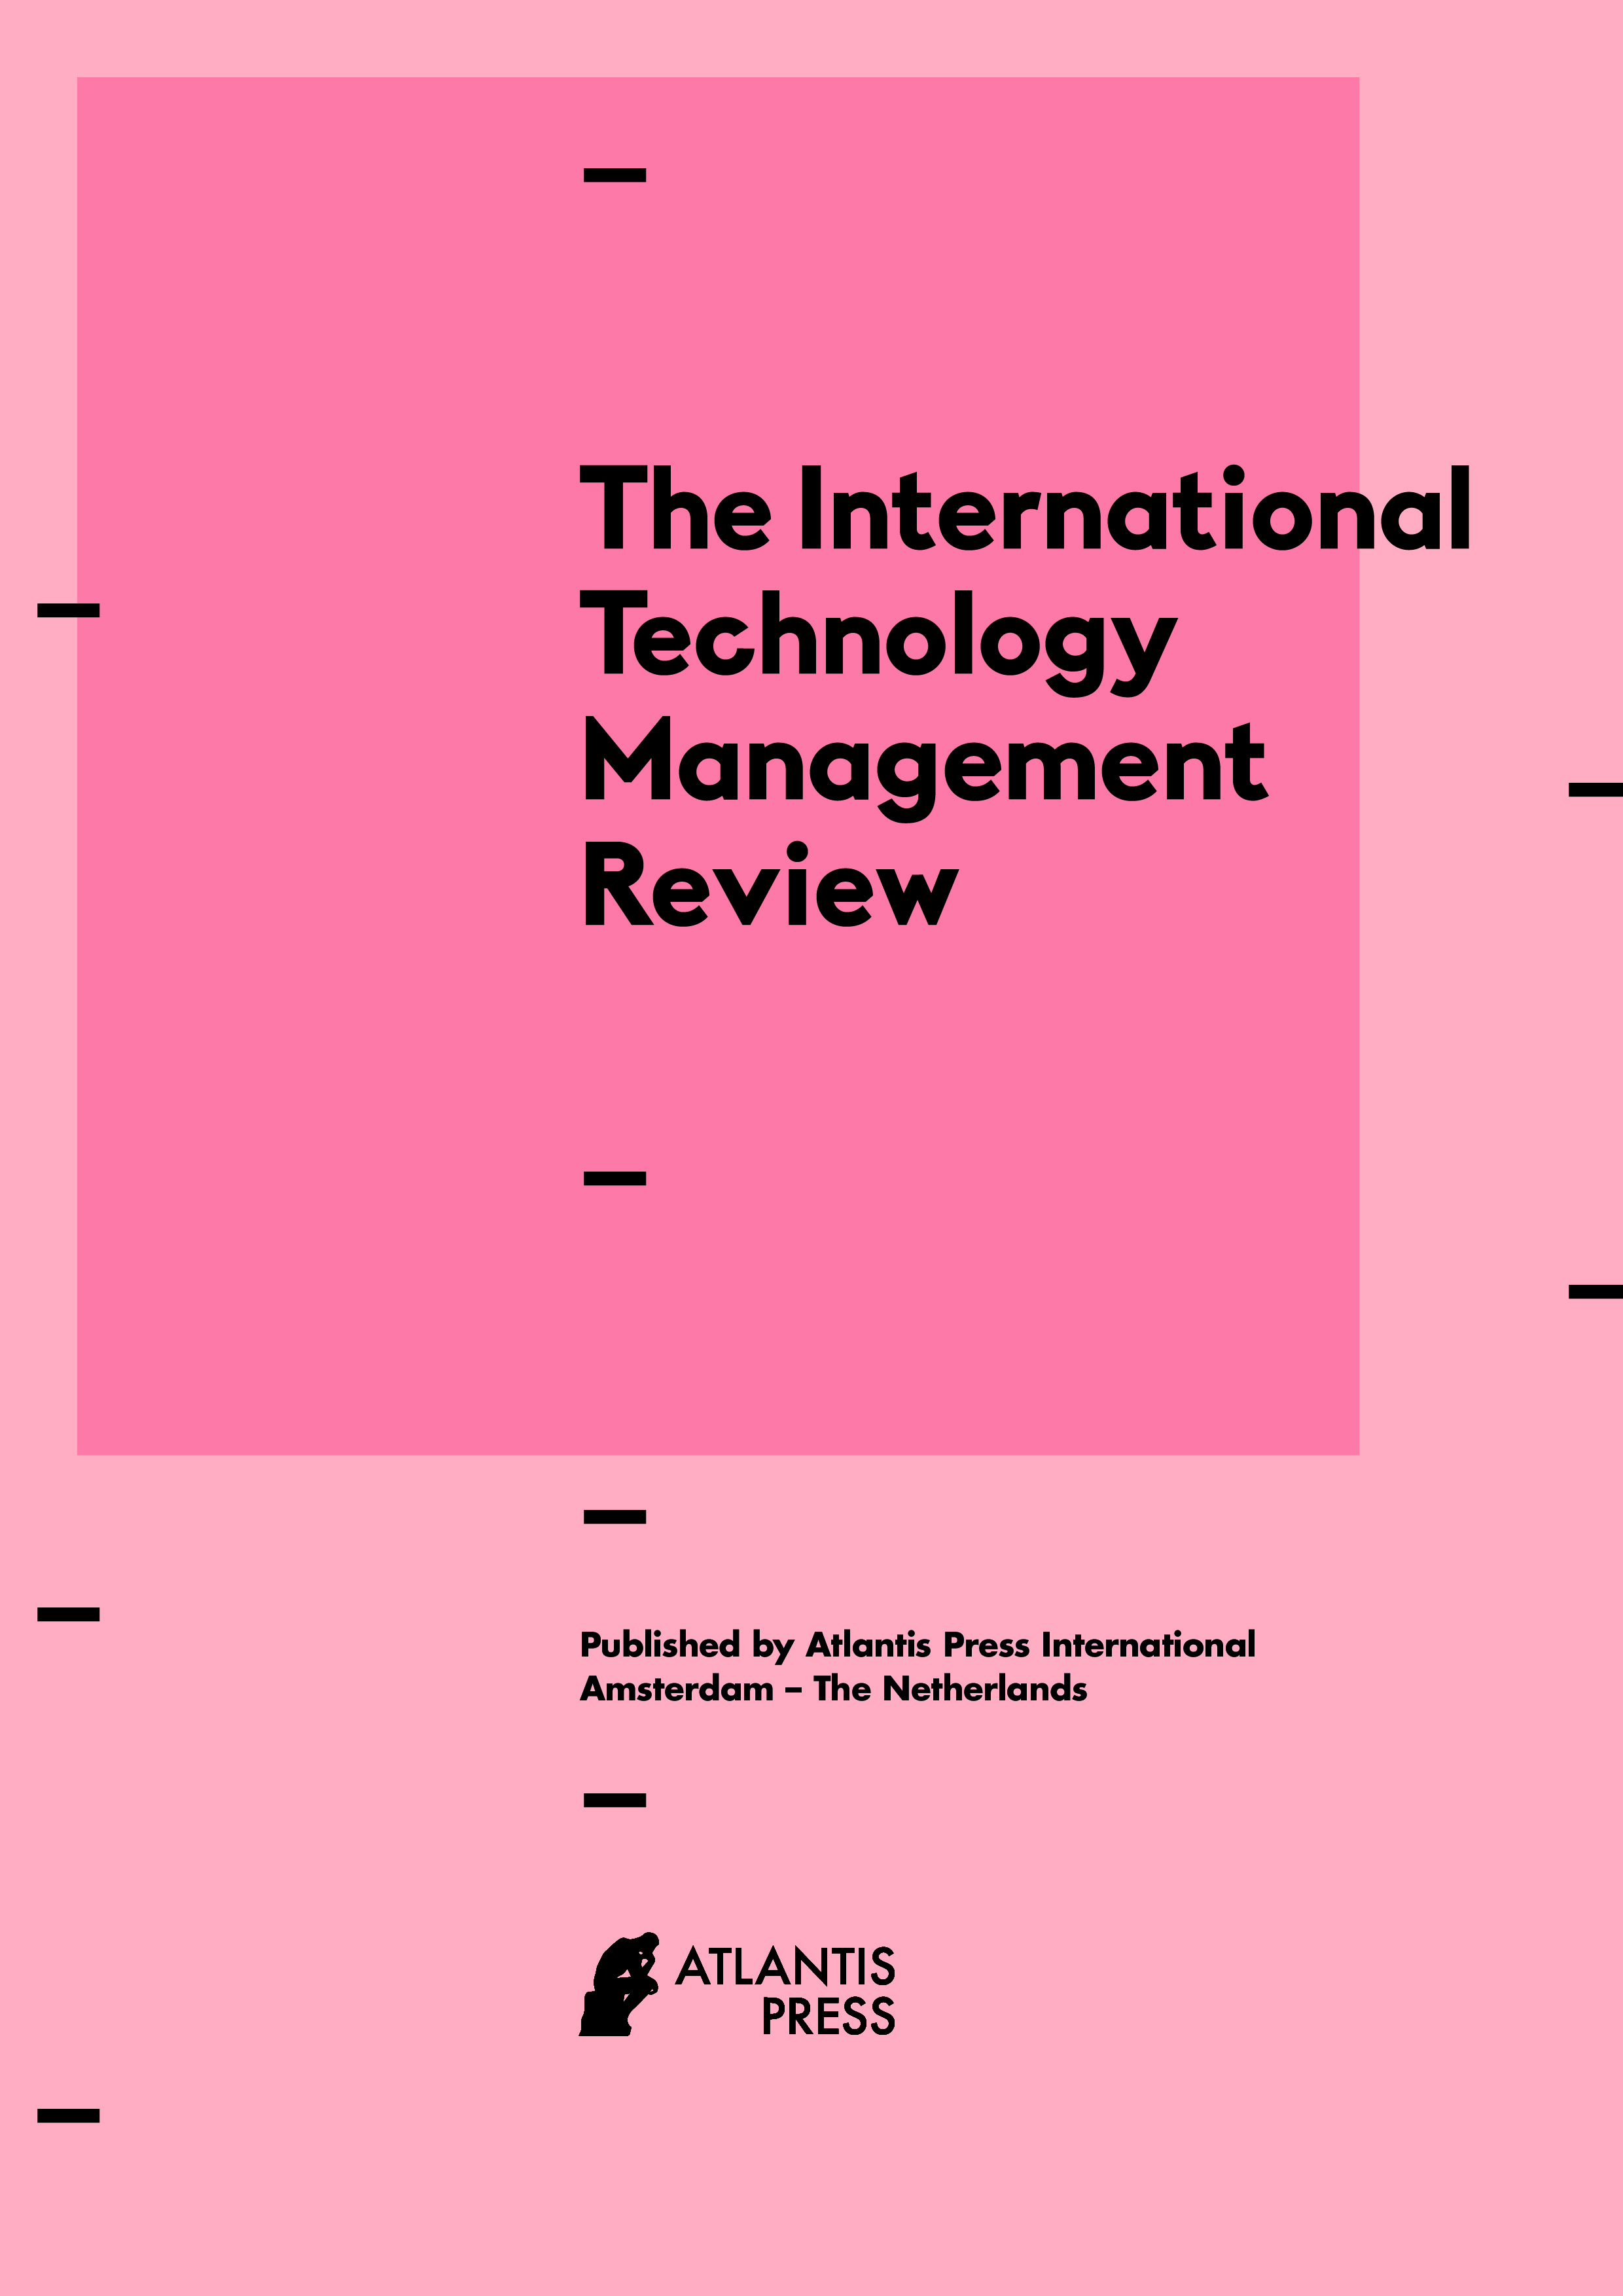 The International Technology Management Review - Preface | Atlantis